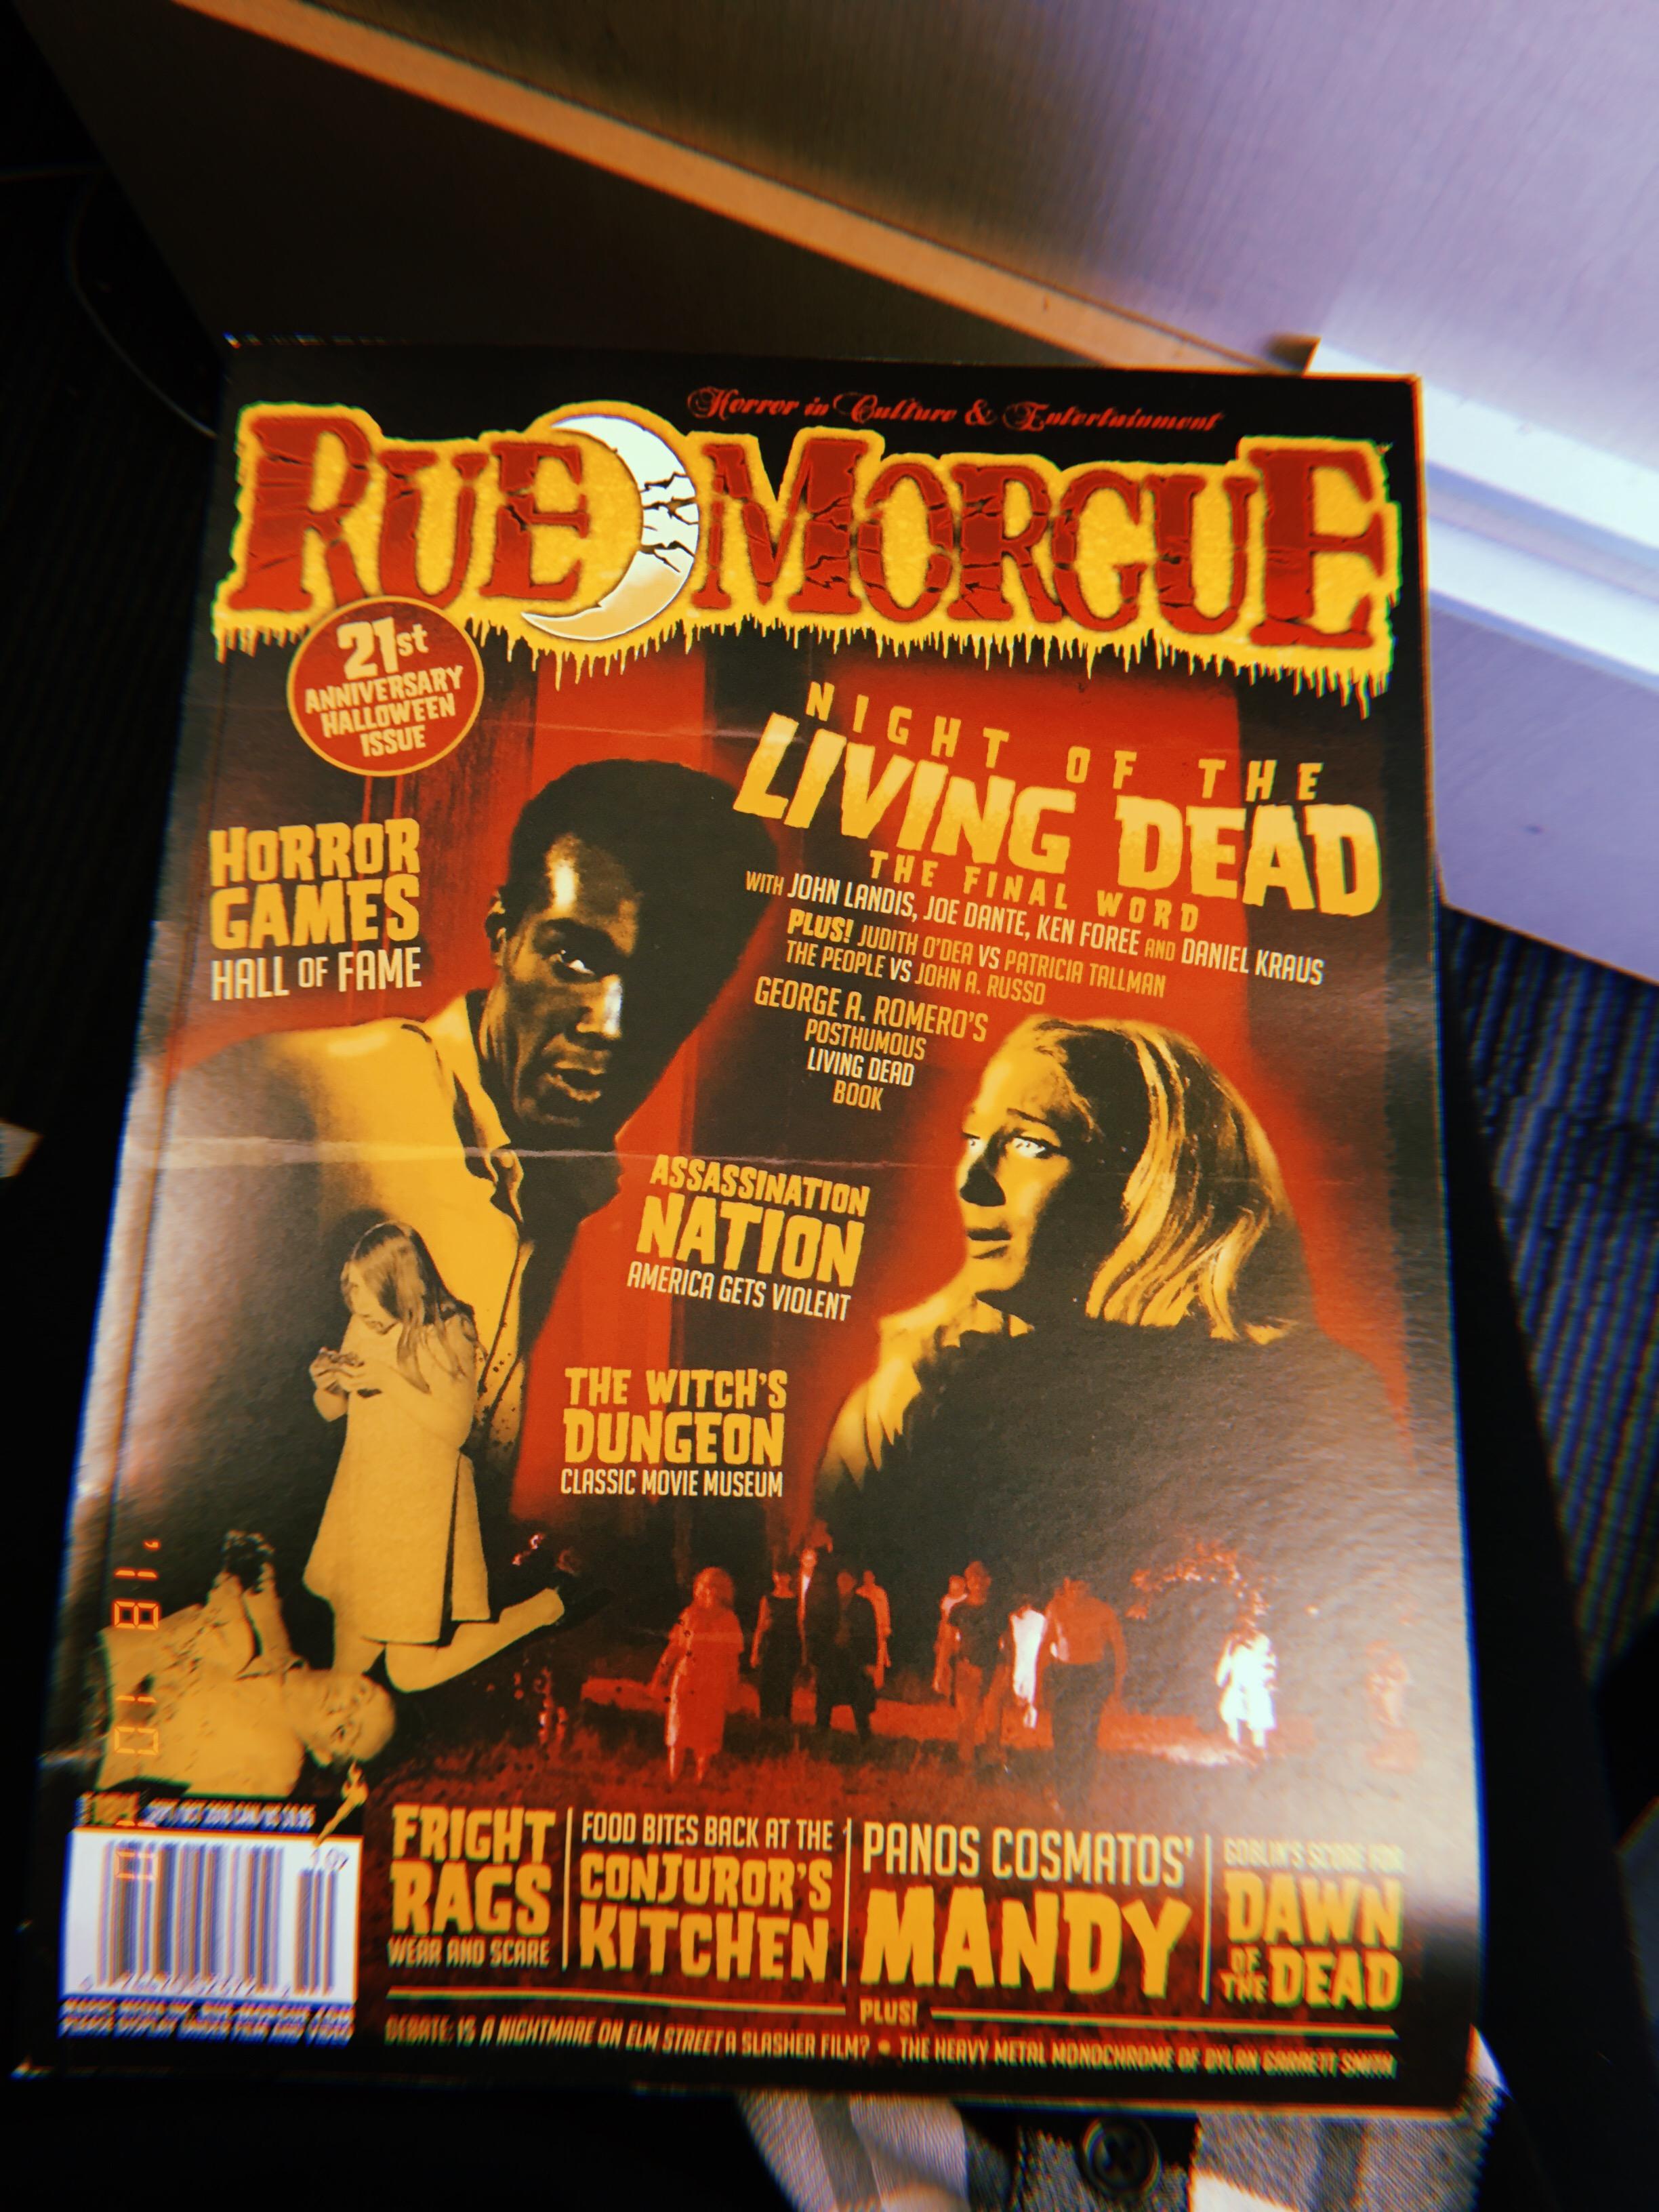 The Sept/Oct edition of Rue Morgue magazine